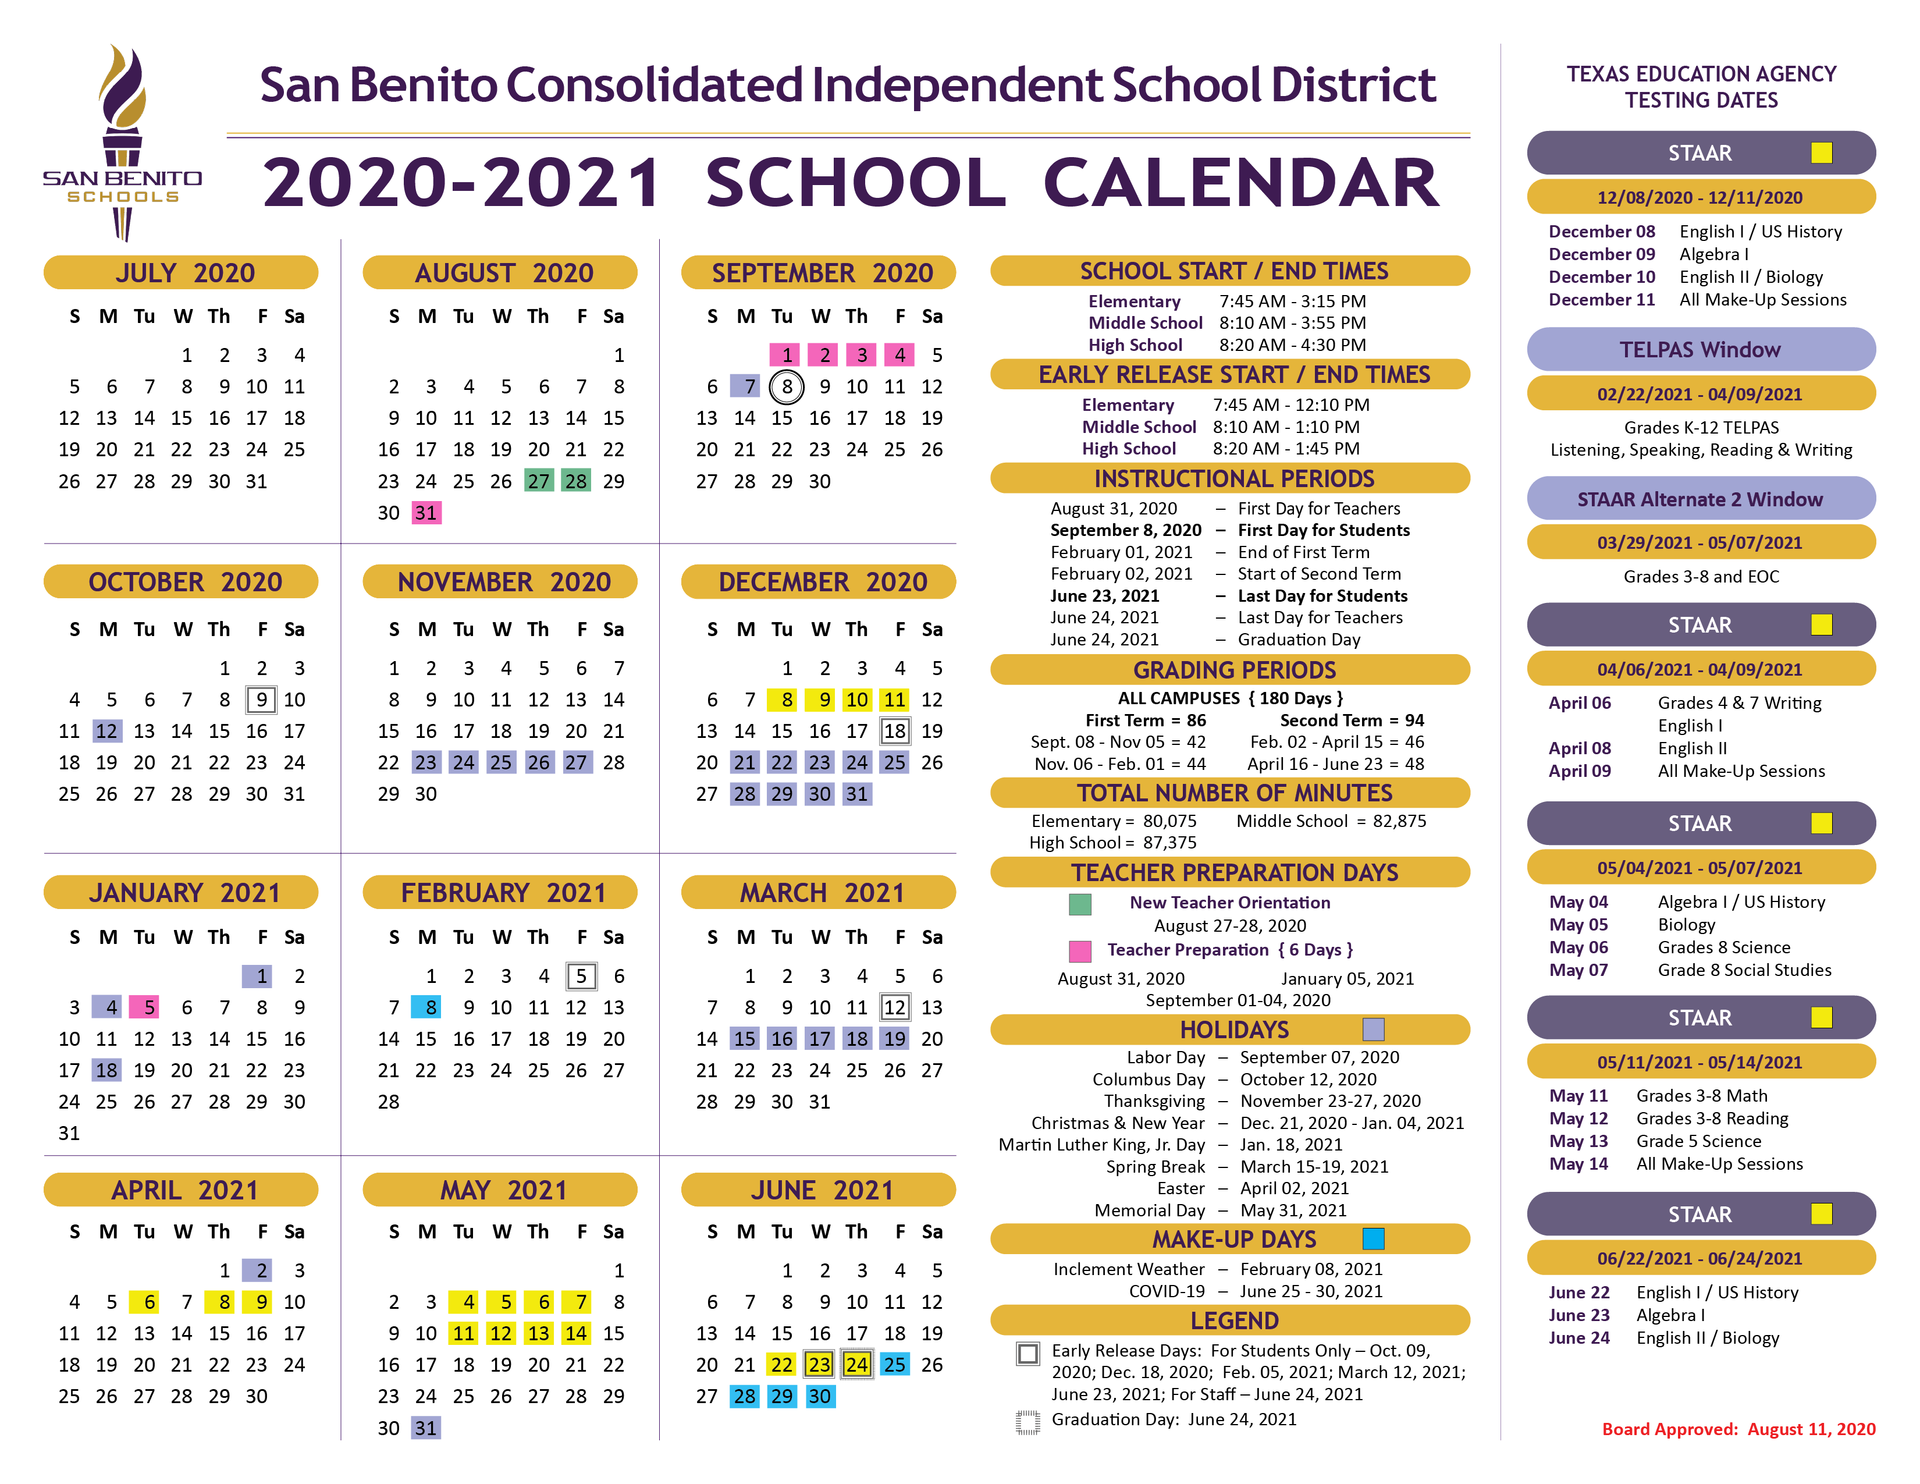 Sbisd Calendar 2021 School Calendar – District – San Benito Consolidated Independent